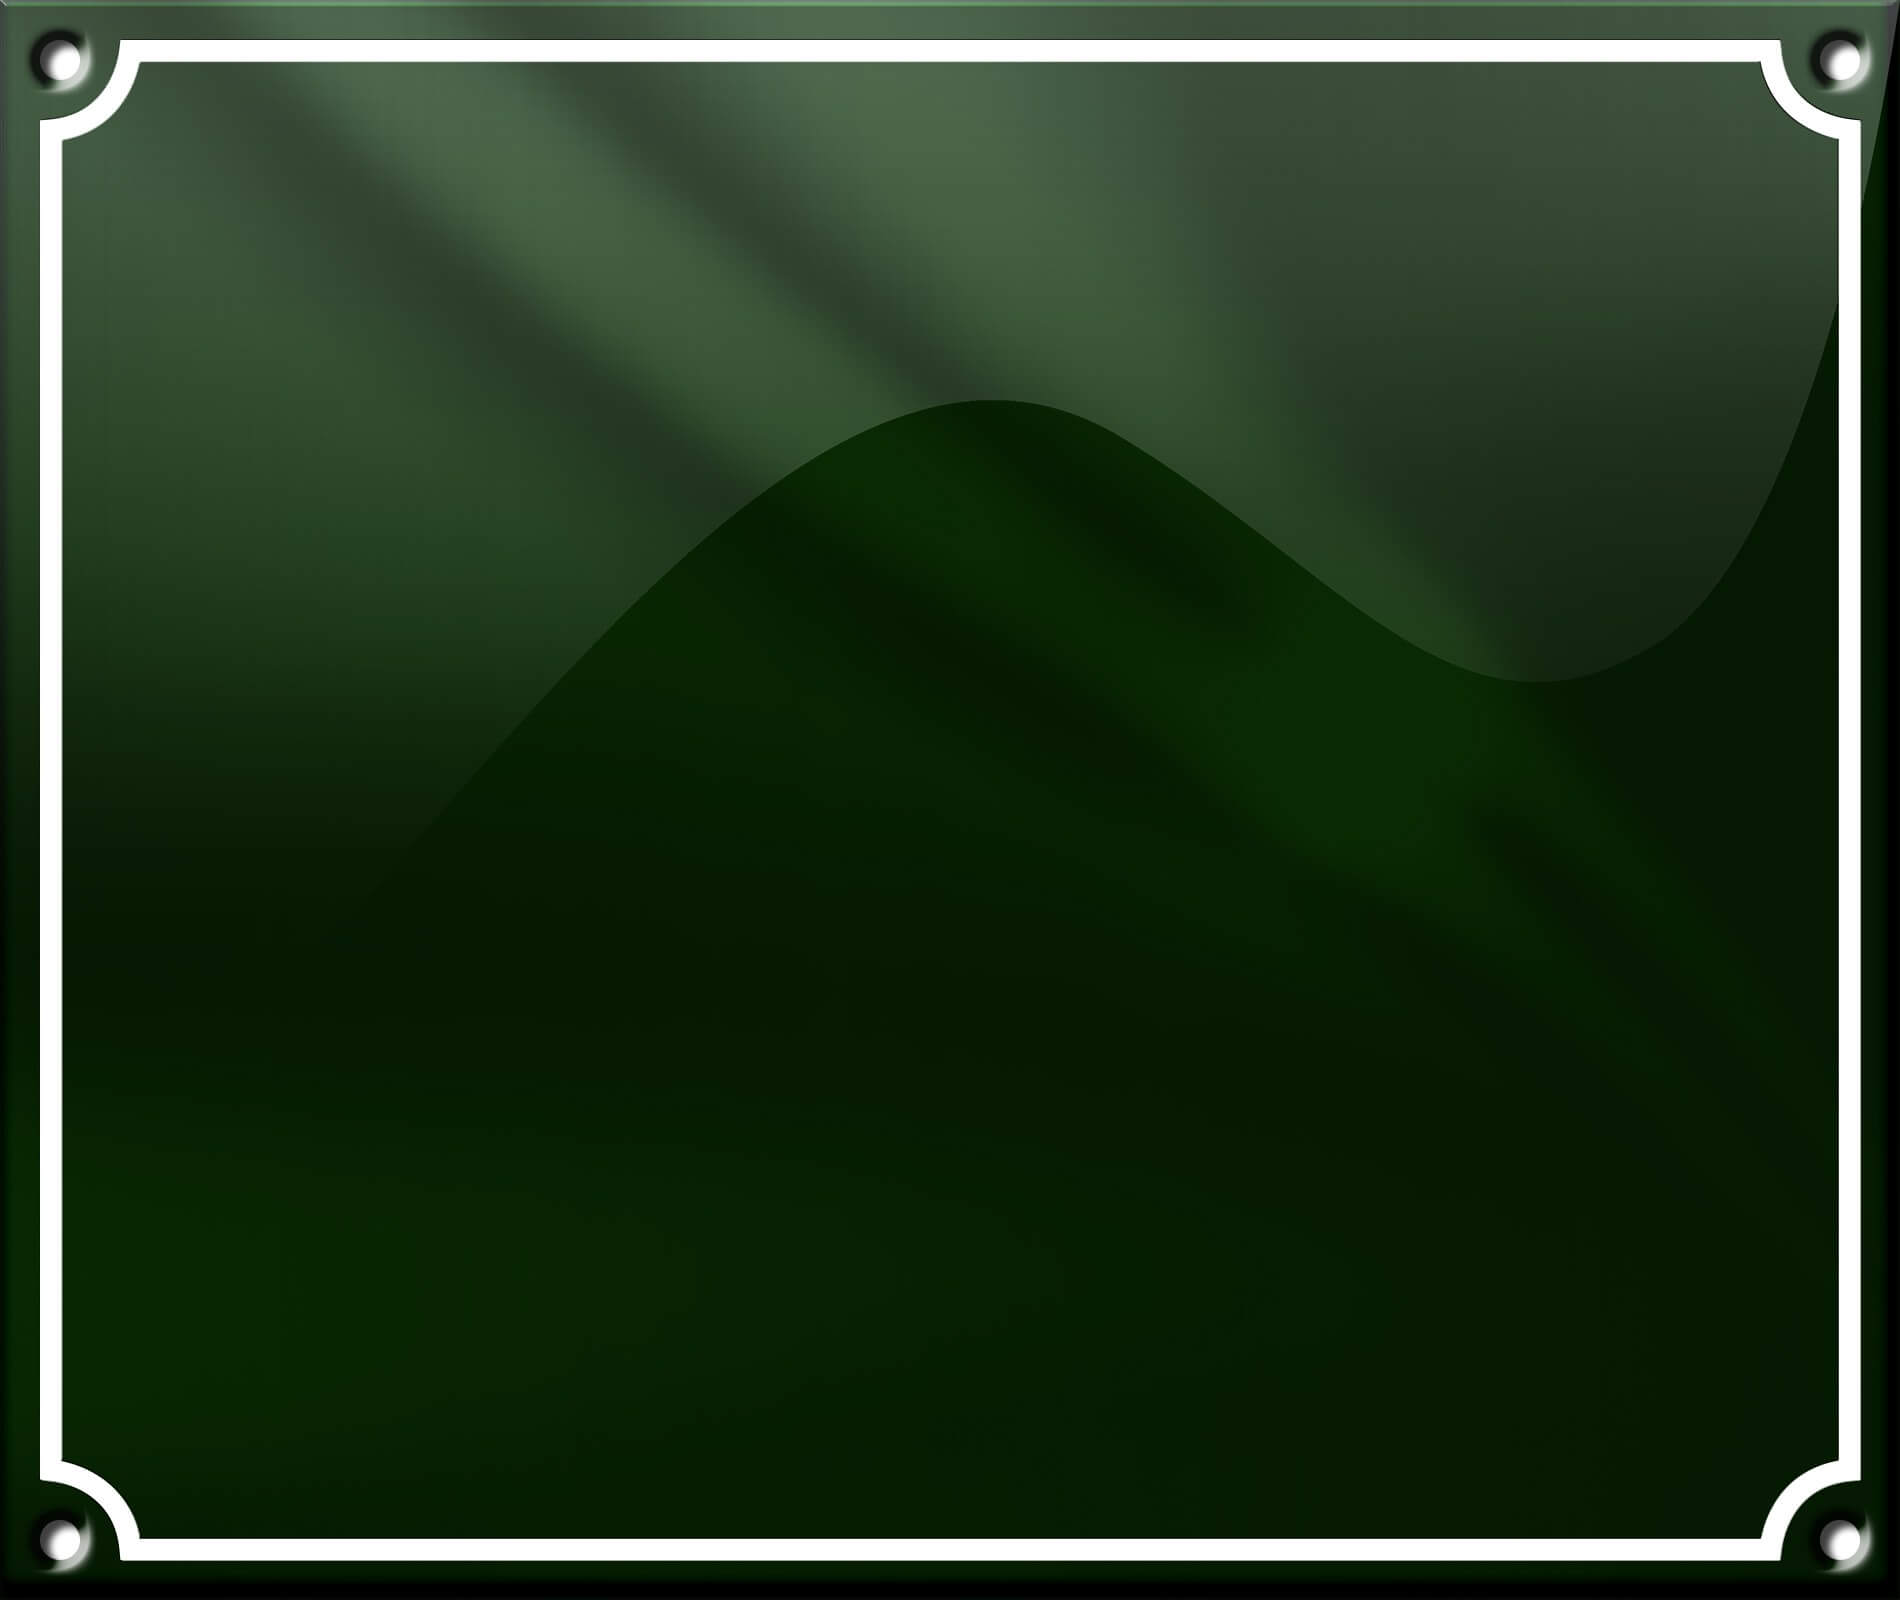 Grøn Enkelt Ramme